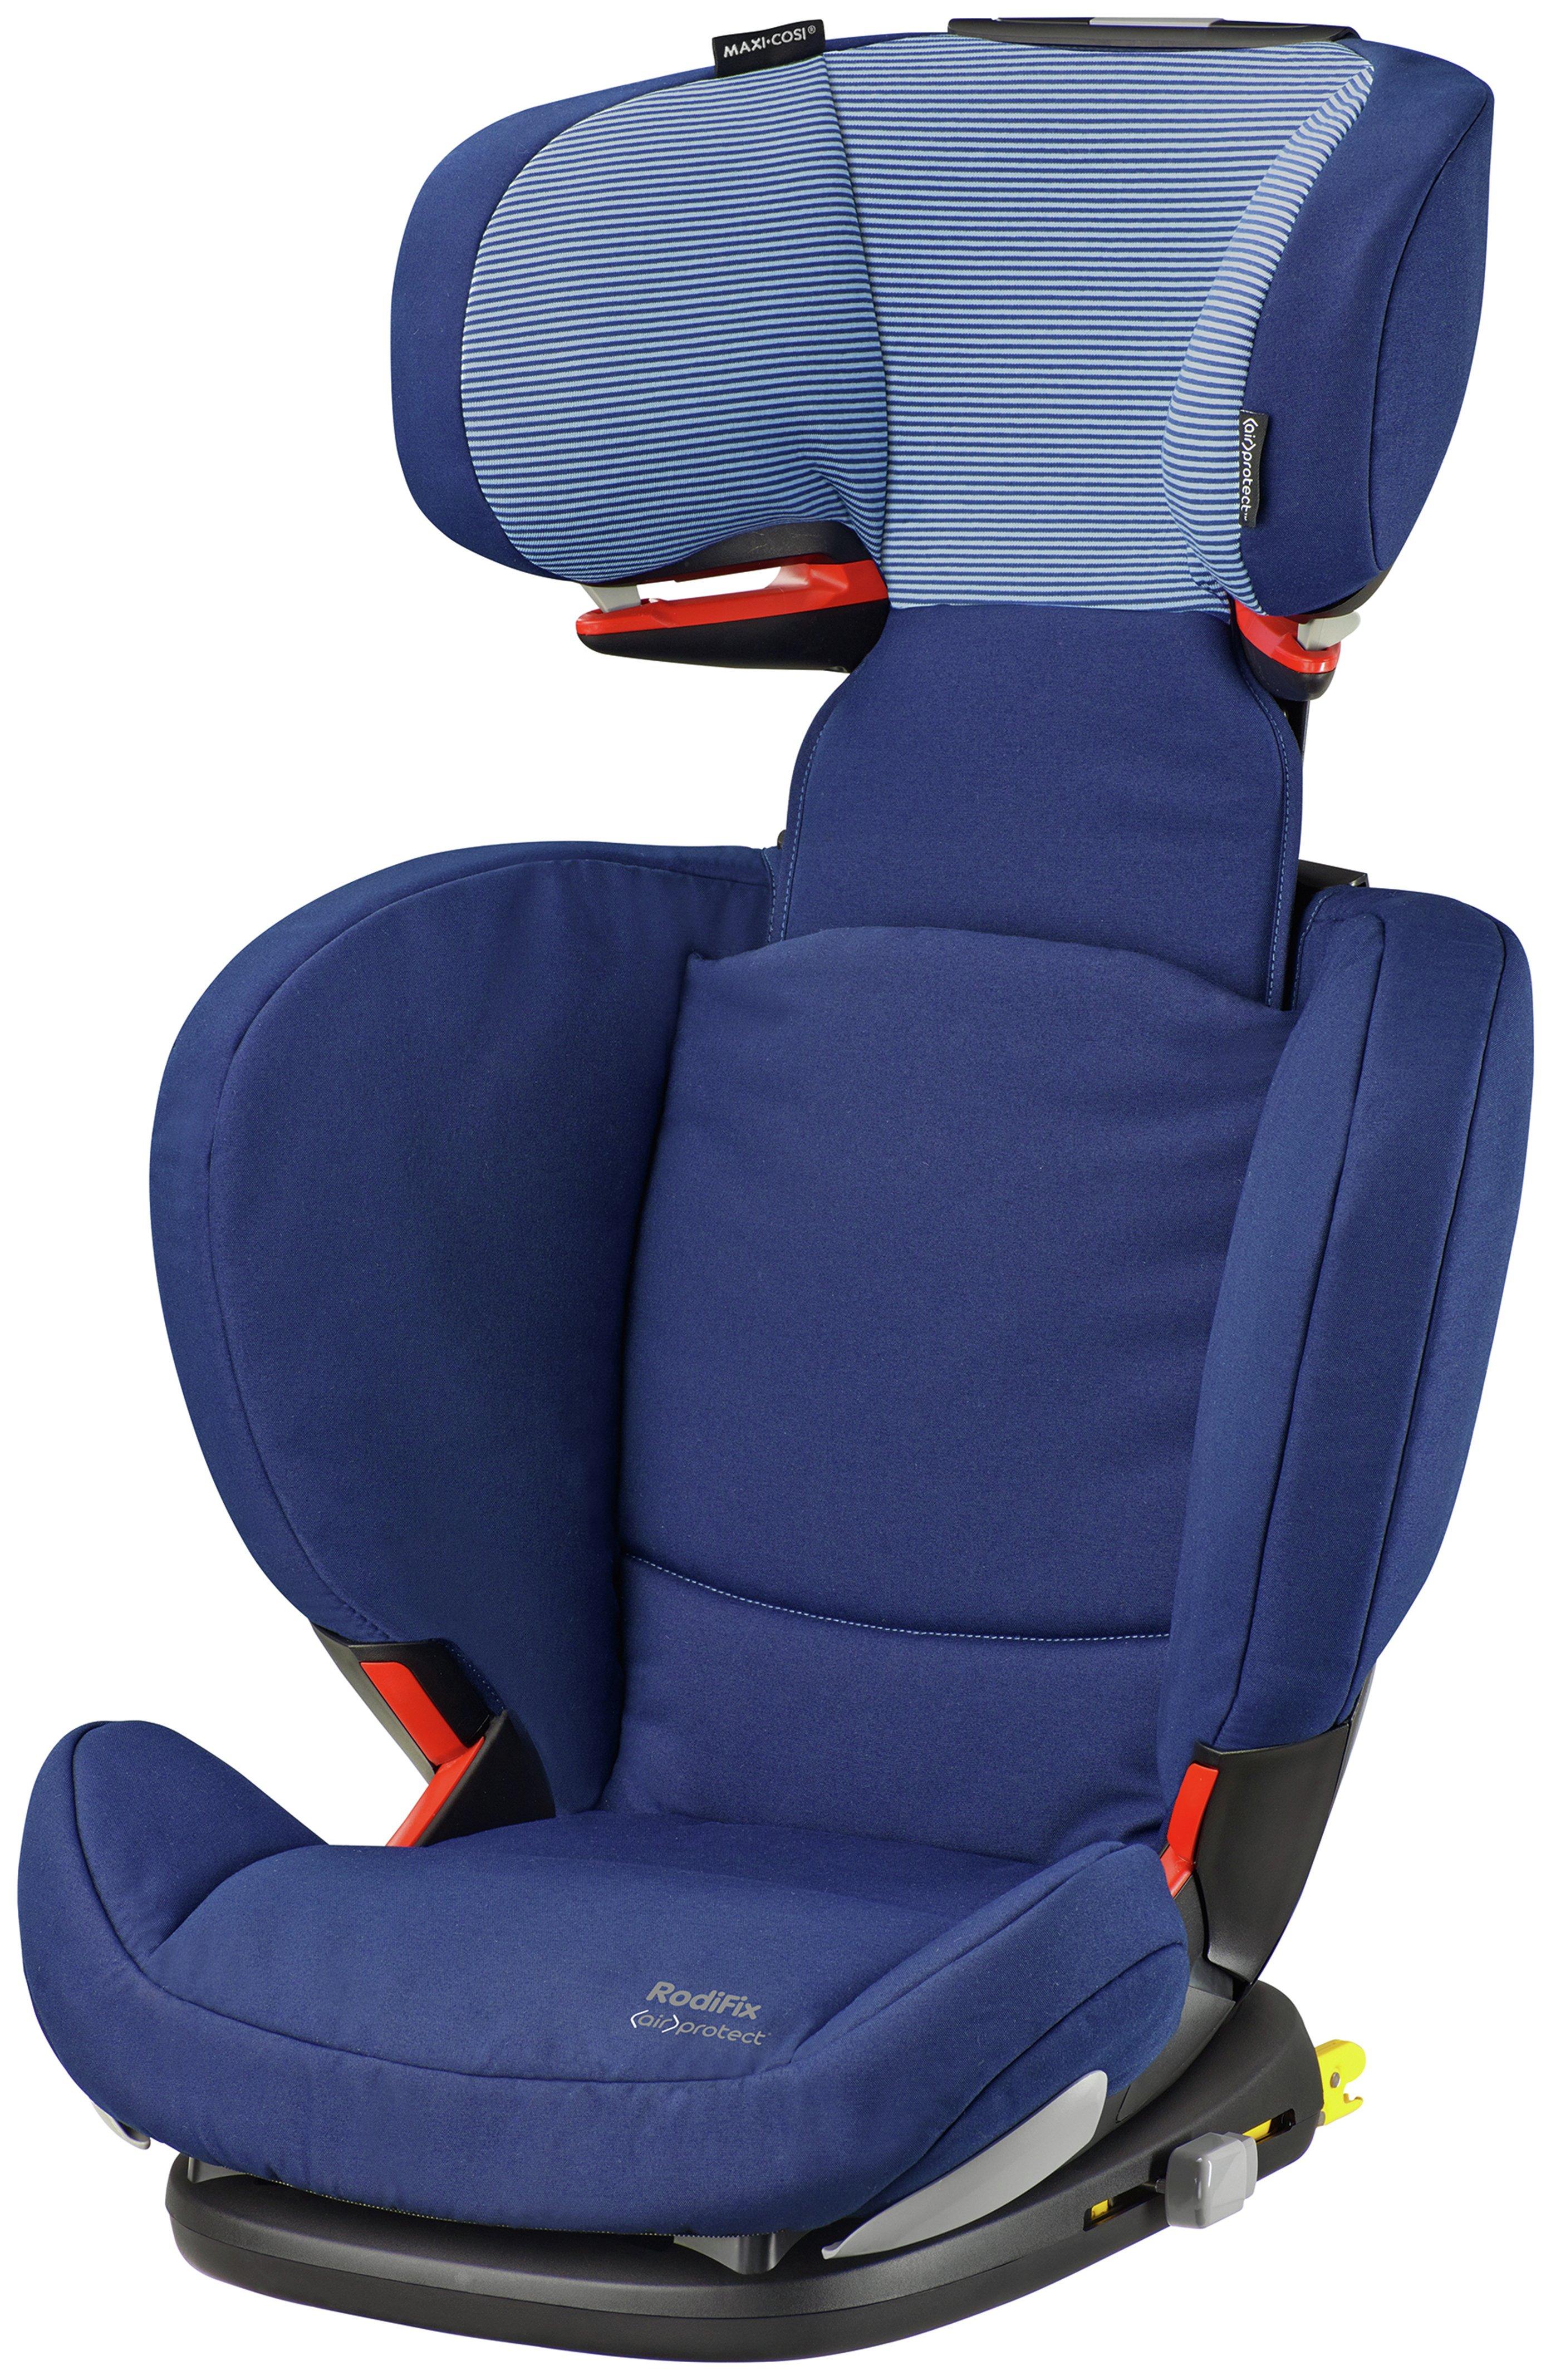 maxi-cosi-rodifix-group-2-3-river-blue-car-seat